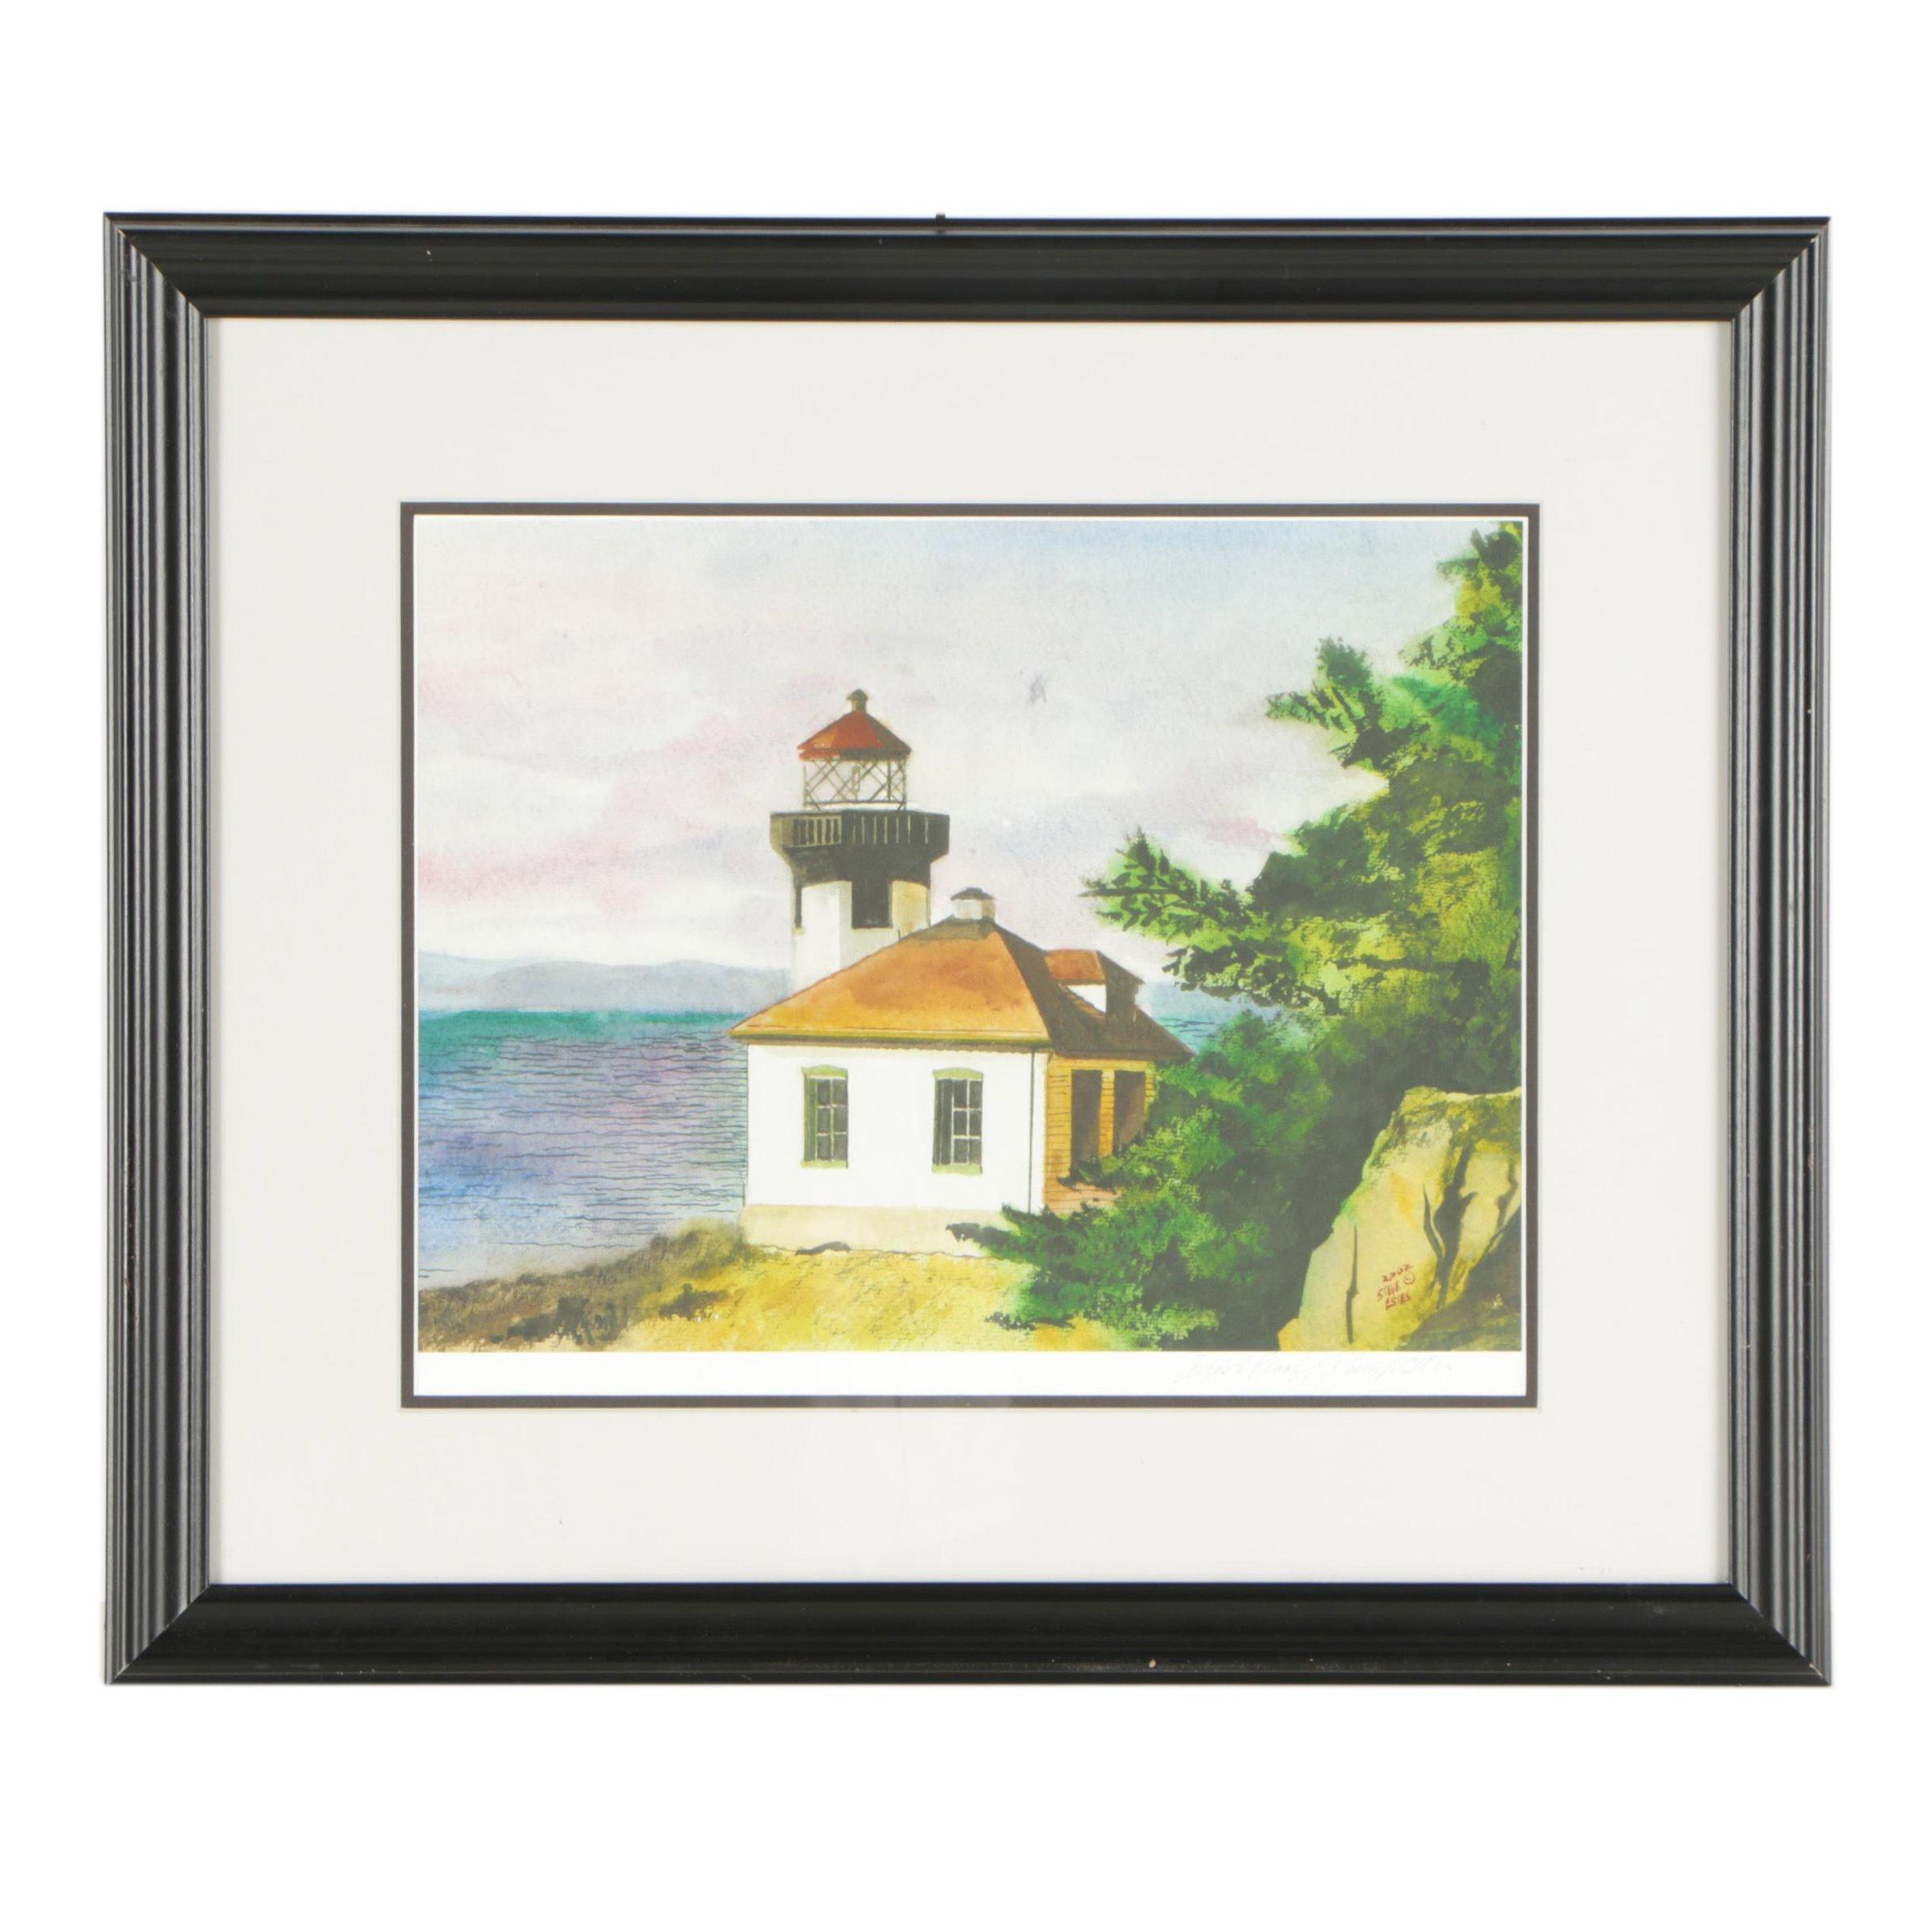 Steve Estes 2002 Artist's Proof Giclée of Coastal Landscape with Lighthouse